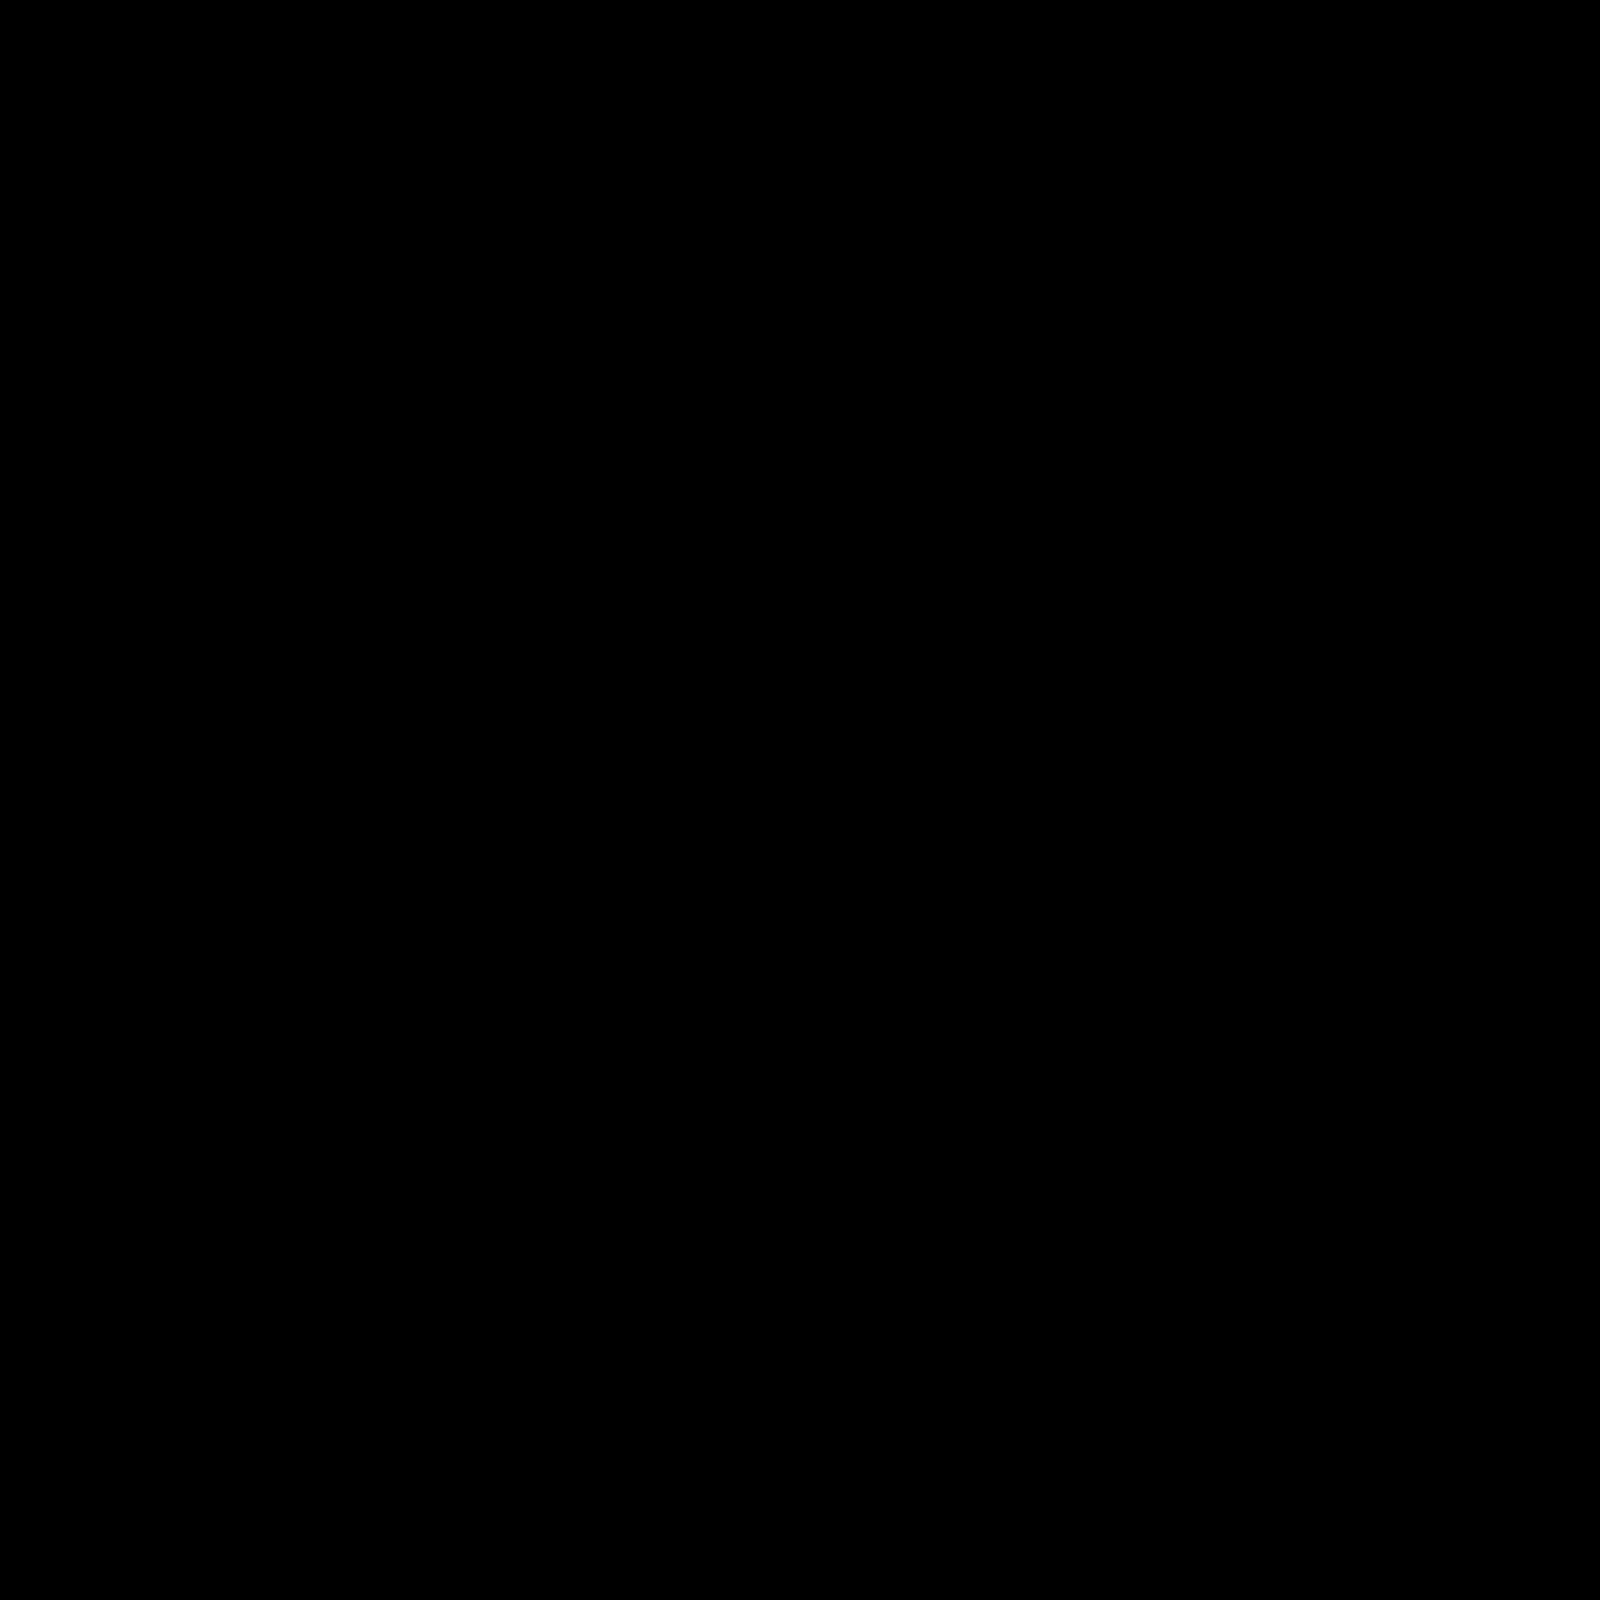 Desk icon kostenloser download. Lamp clipart sound light